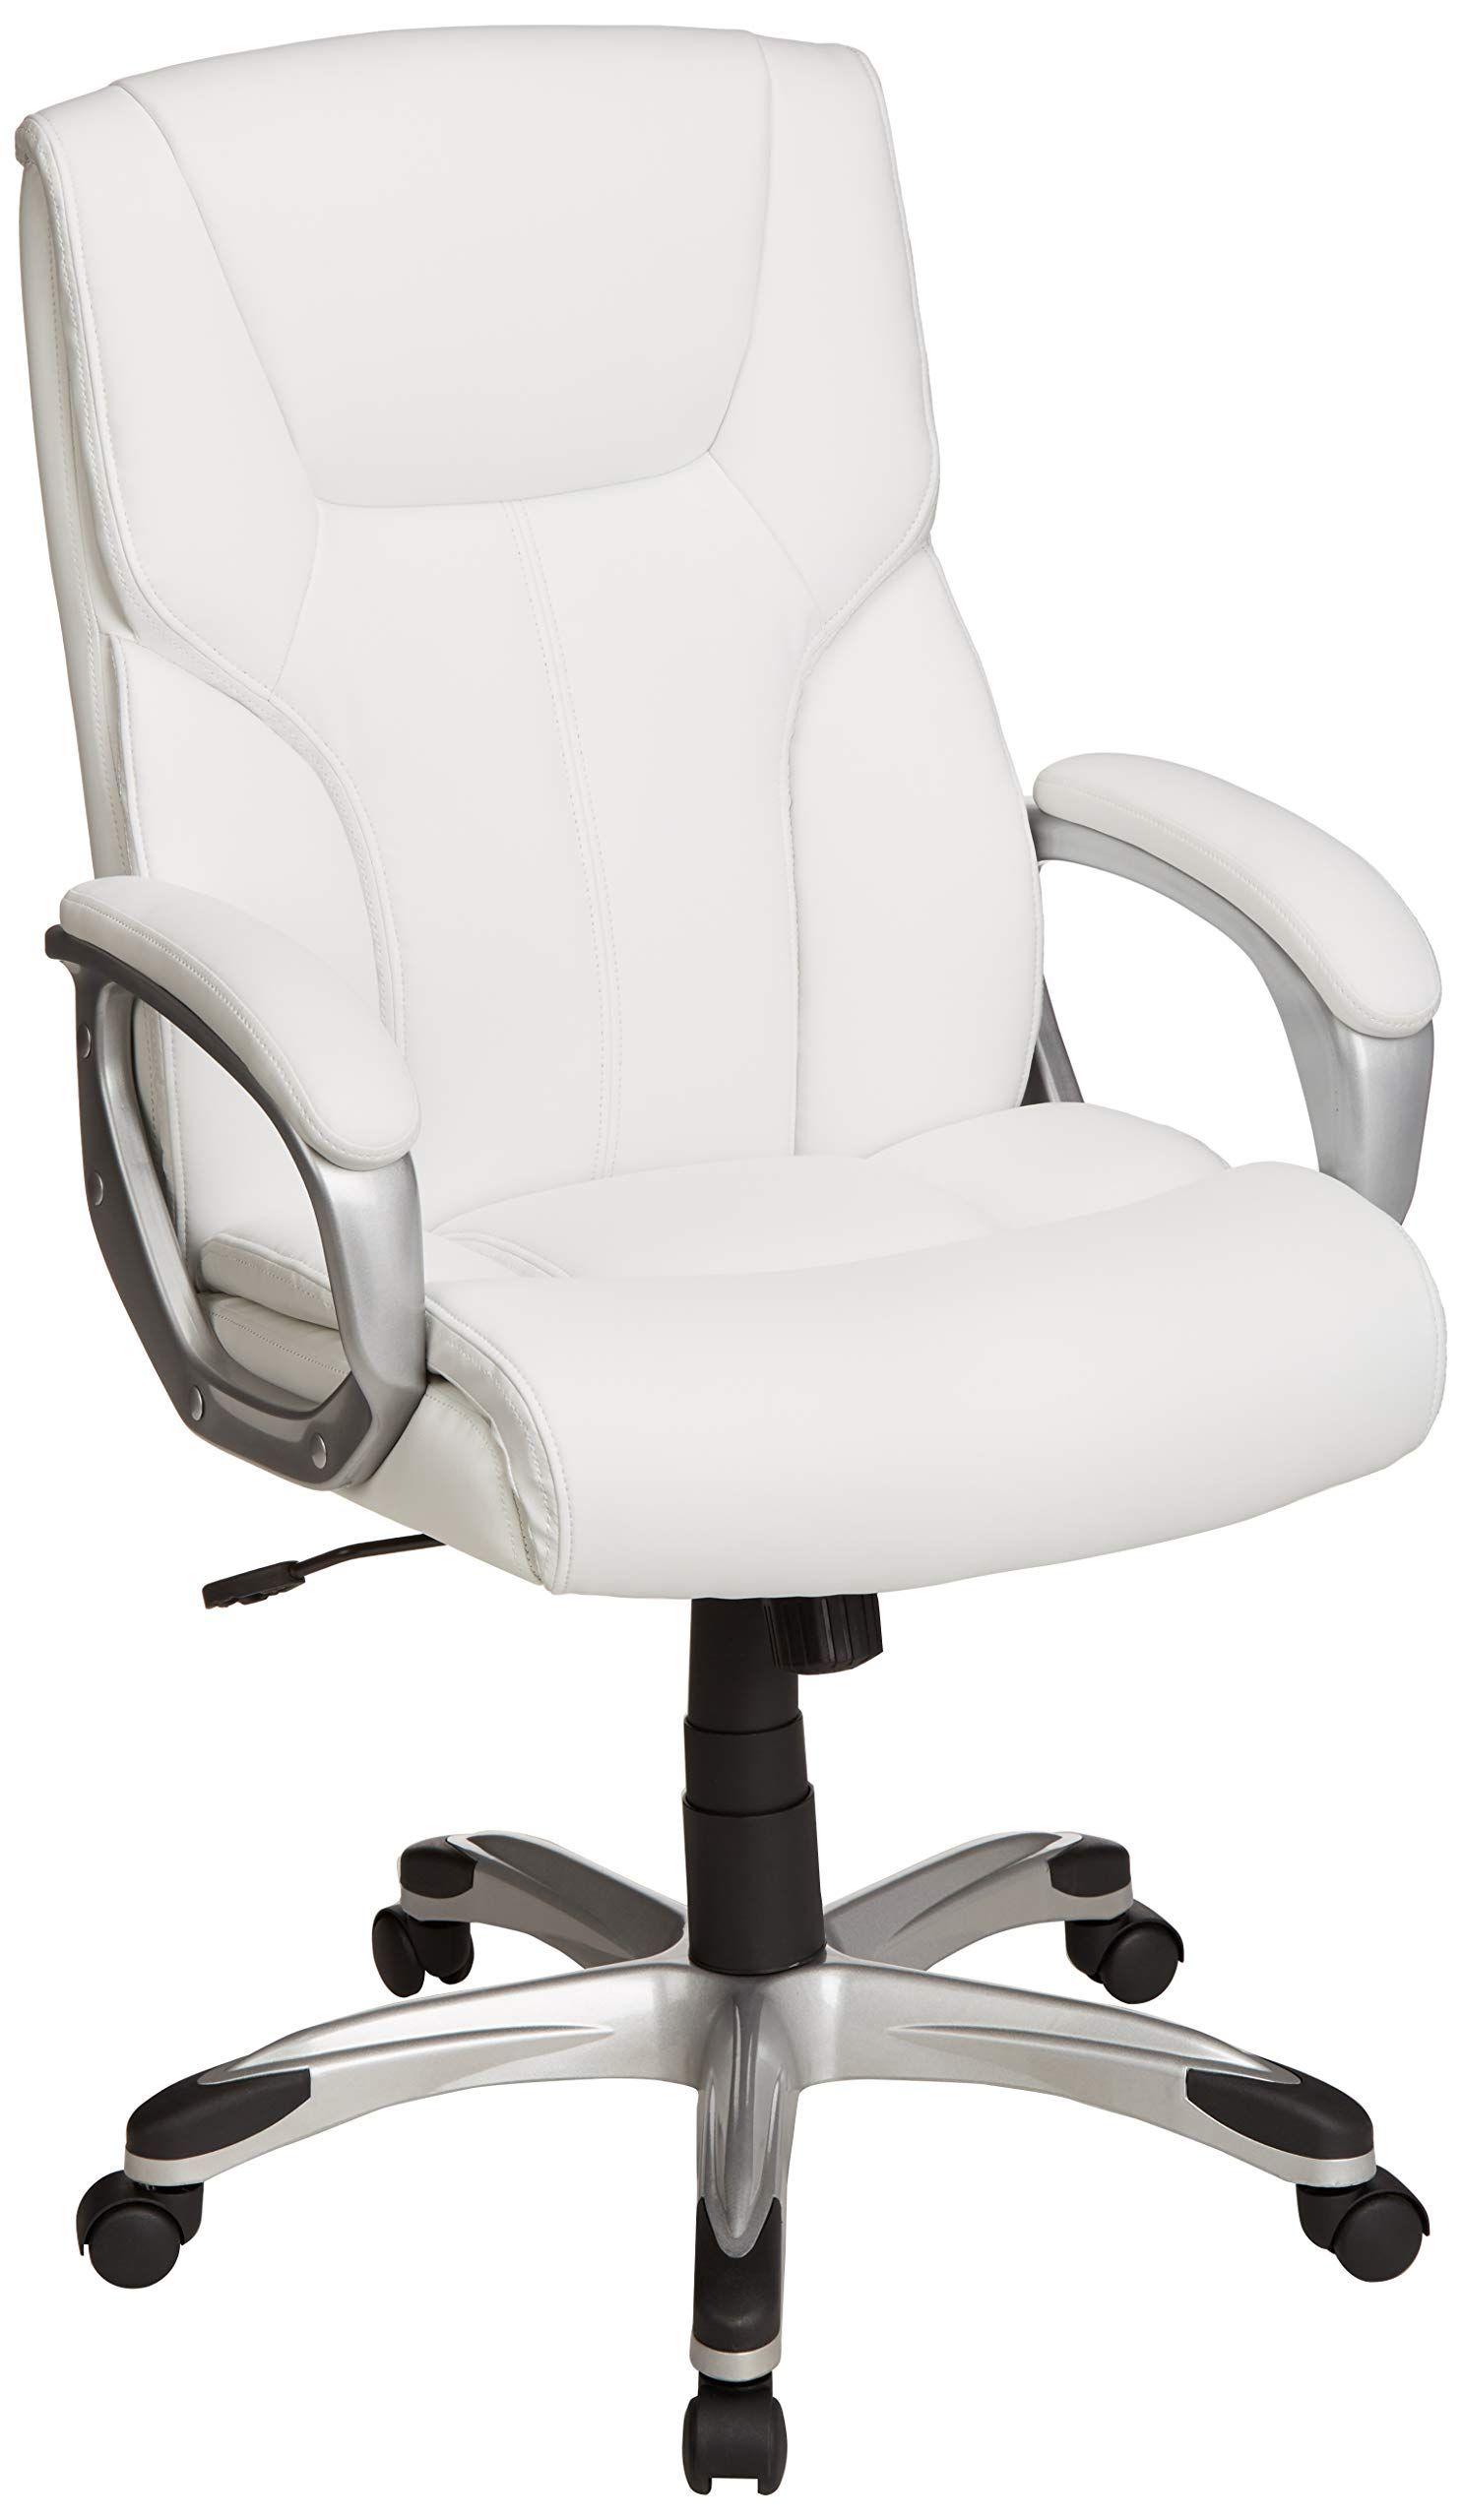 Amazonbasics High Back Executive Swivel Office Desk Chair White With Pewter Finish Bifma Certif White Office Chair Best Office Chair Adjustable Office Desks